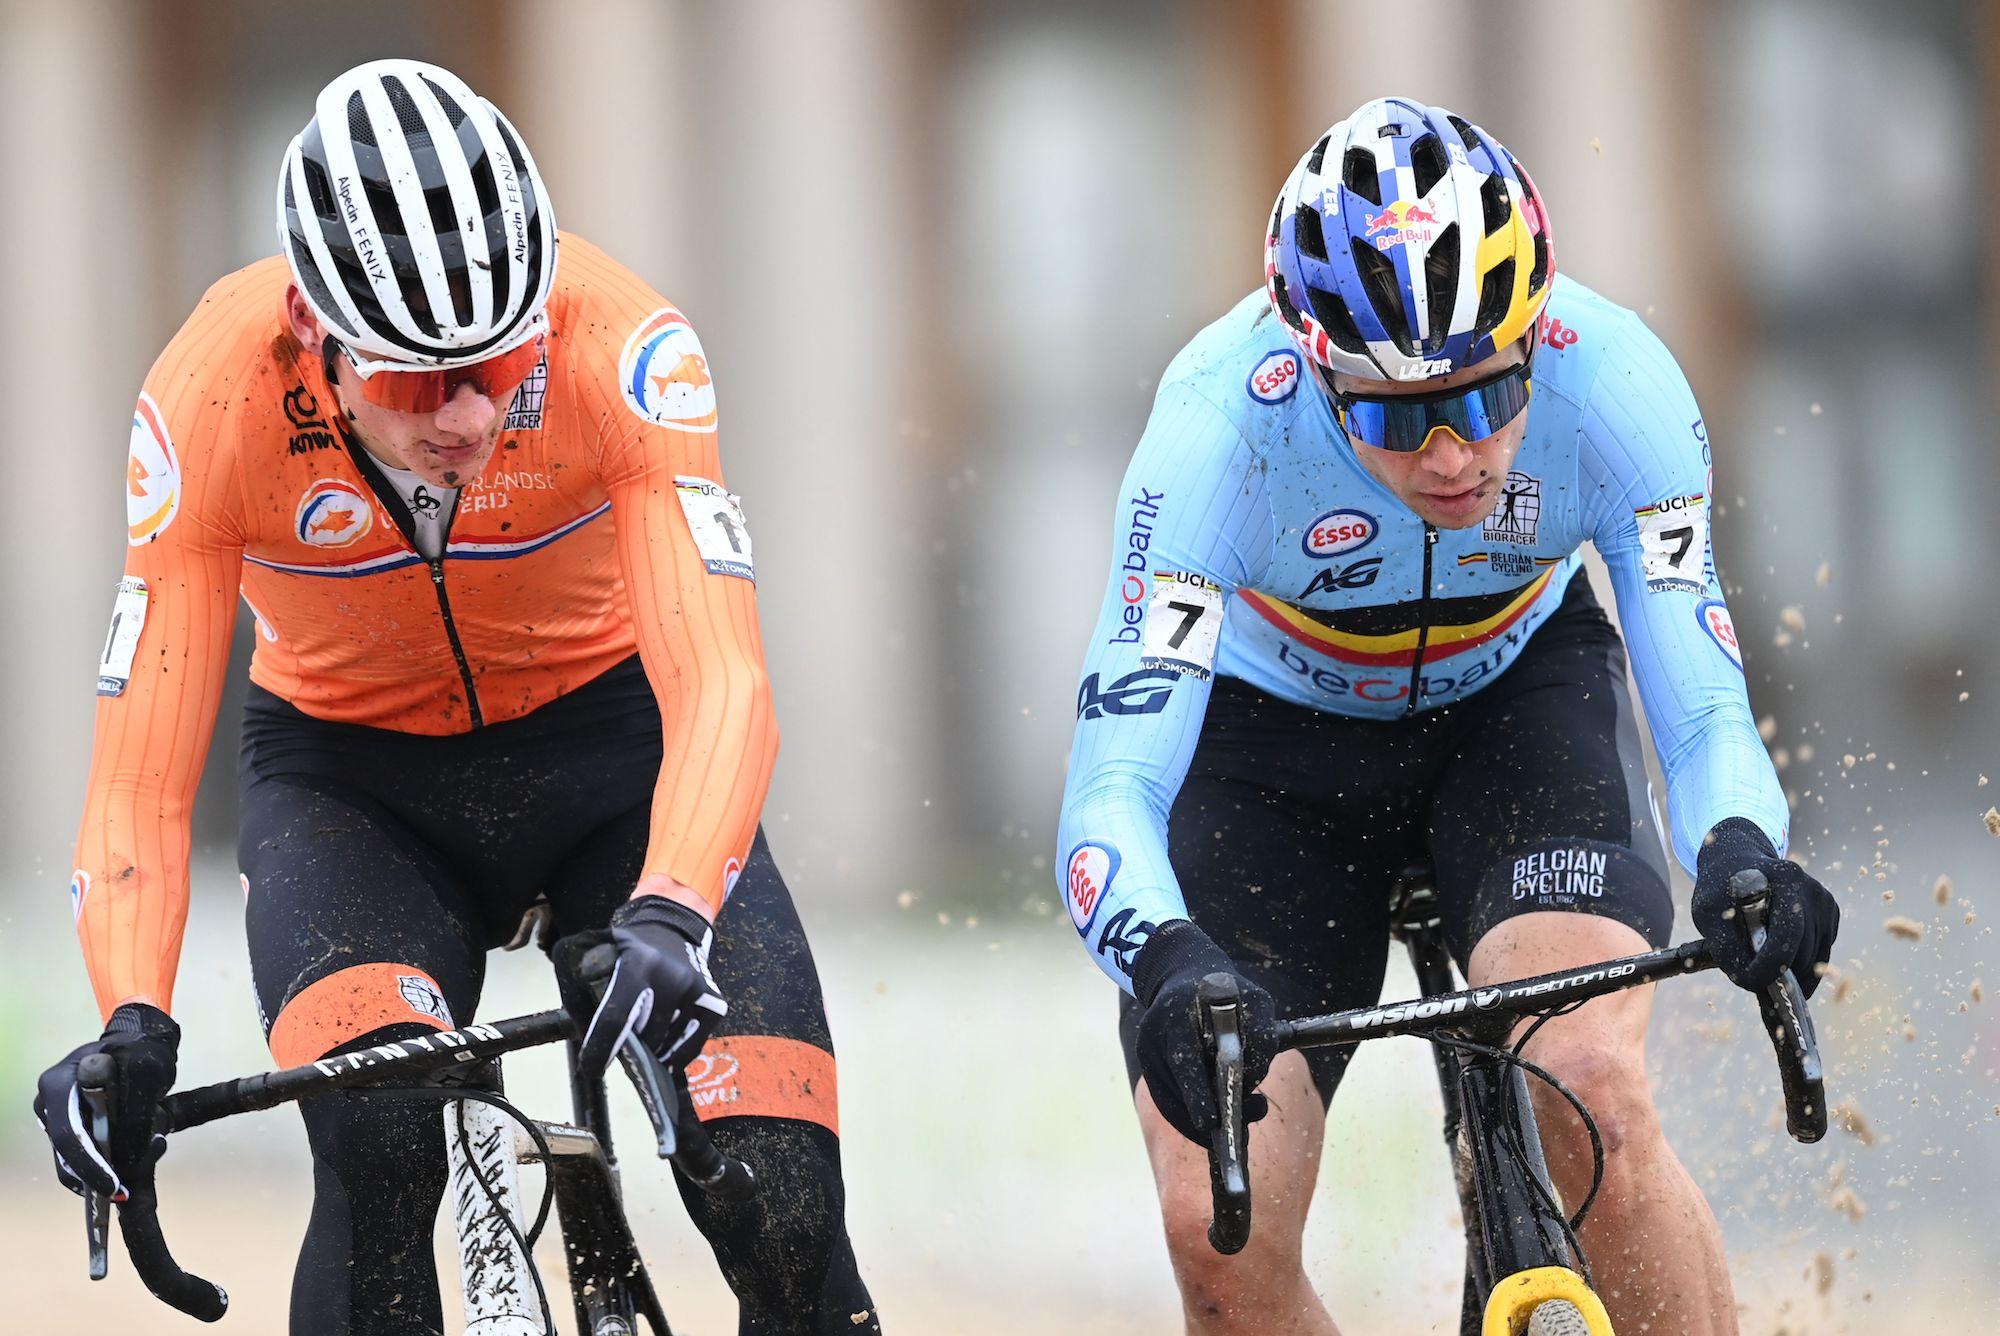 mathieu van der poel beats wout van aert to take third straight cyclocross world championships title cycling weekly